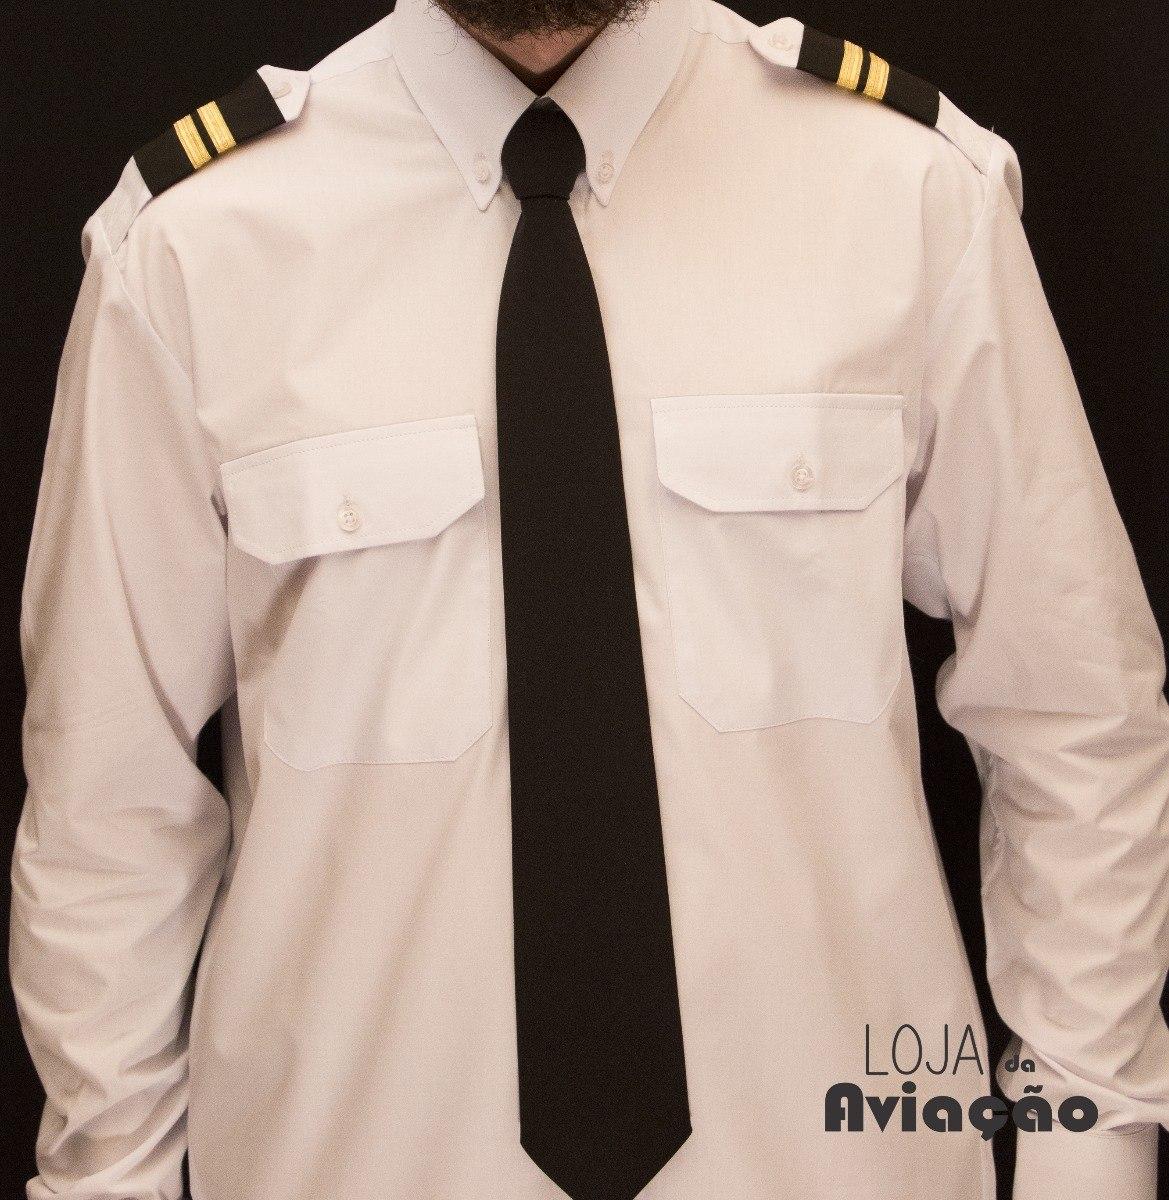 48590ba5690 Camisa Branca Social Uniforme De Piloto Manga Longa - R  89